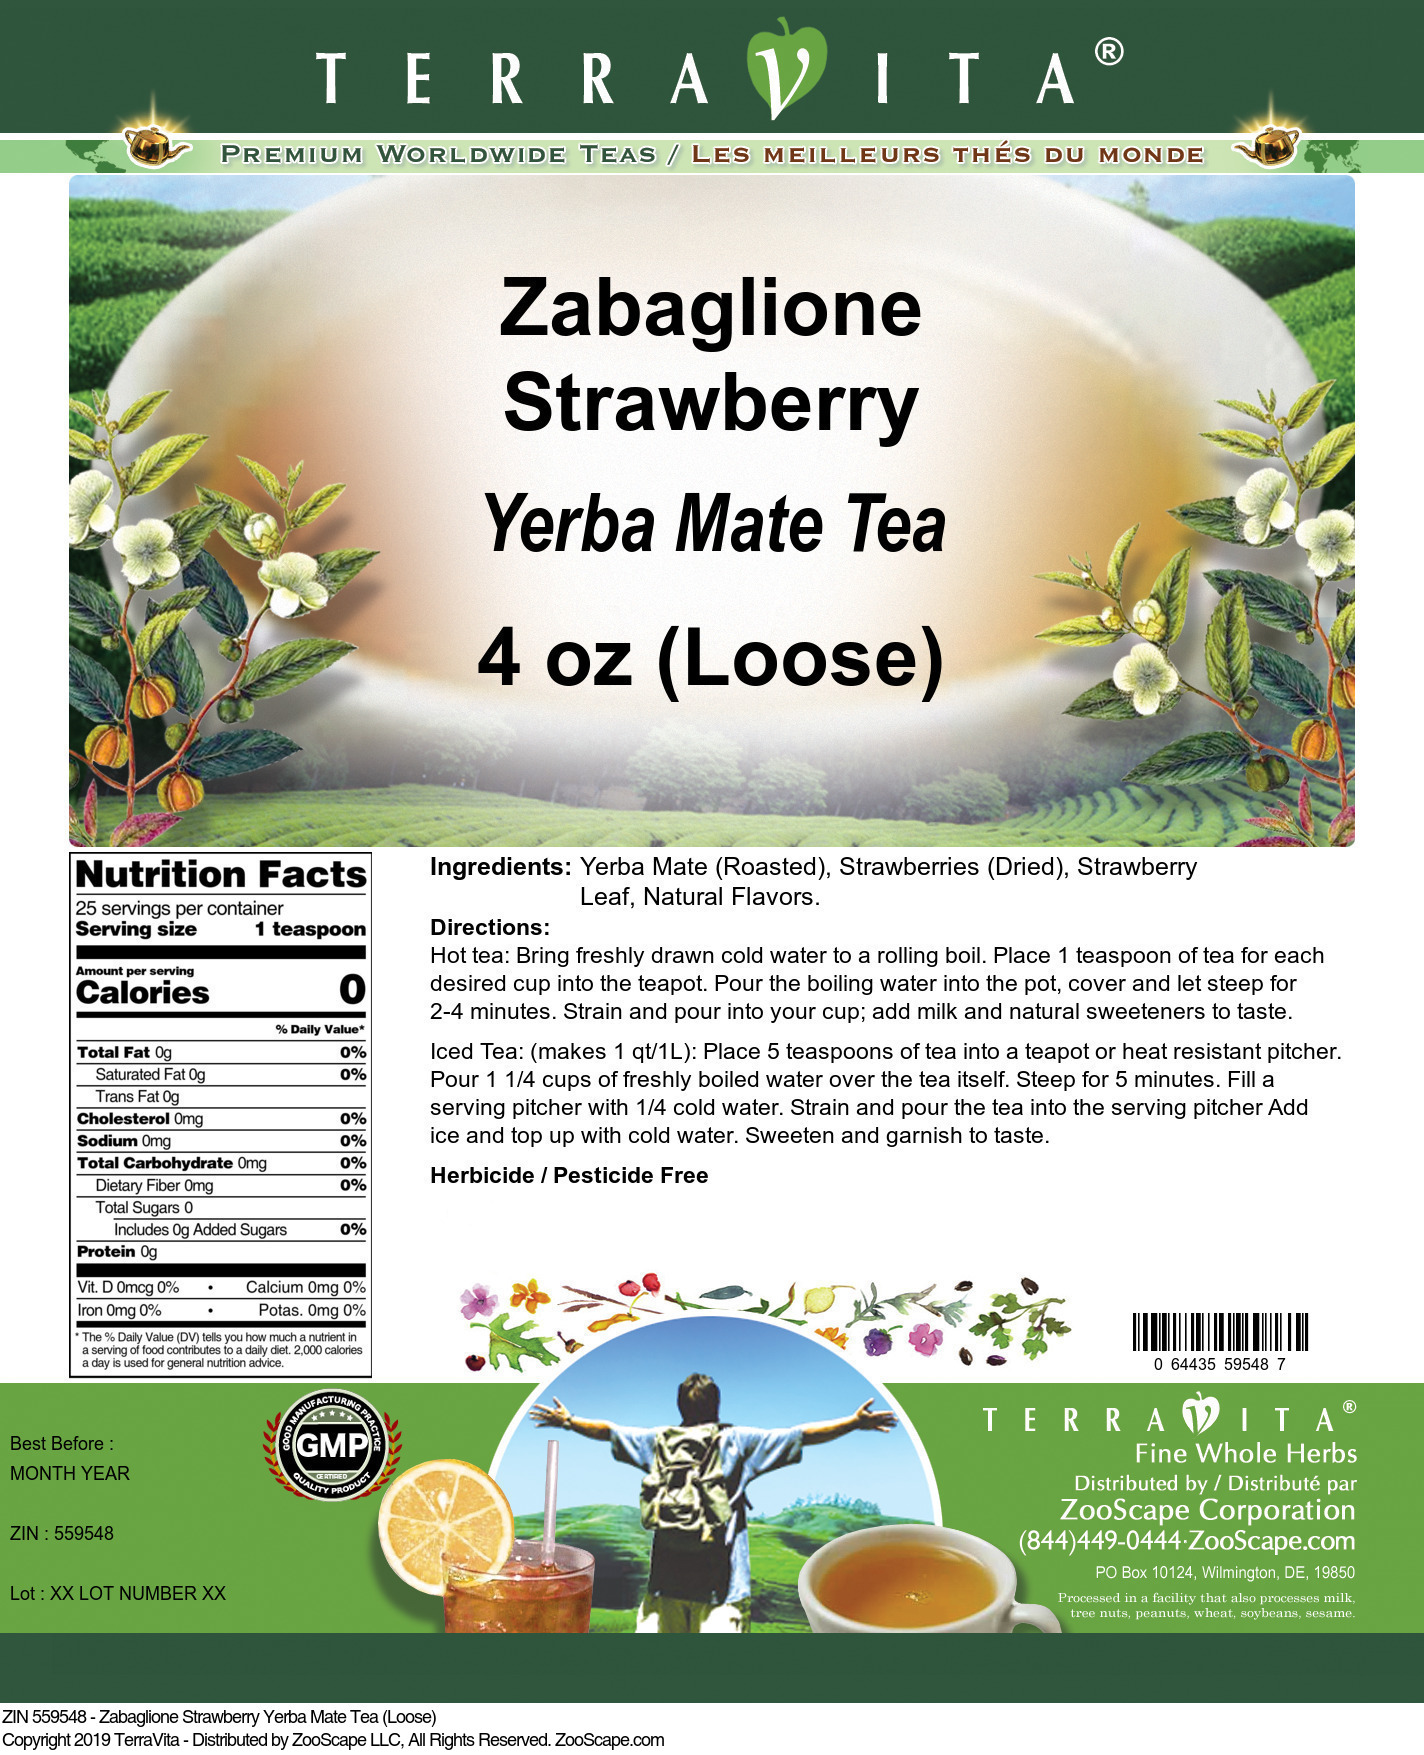 Zabaglione Strawberry Yerba Mate